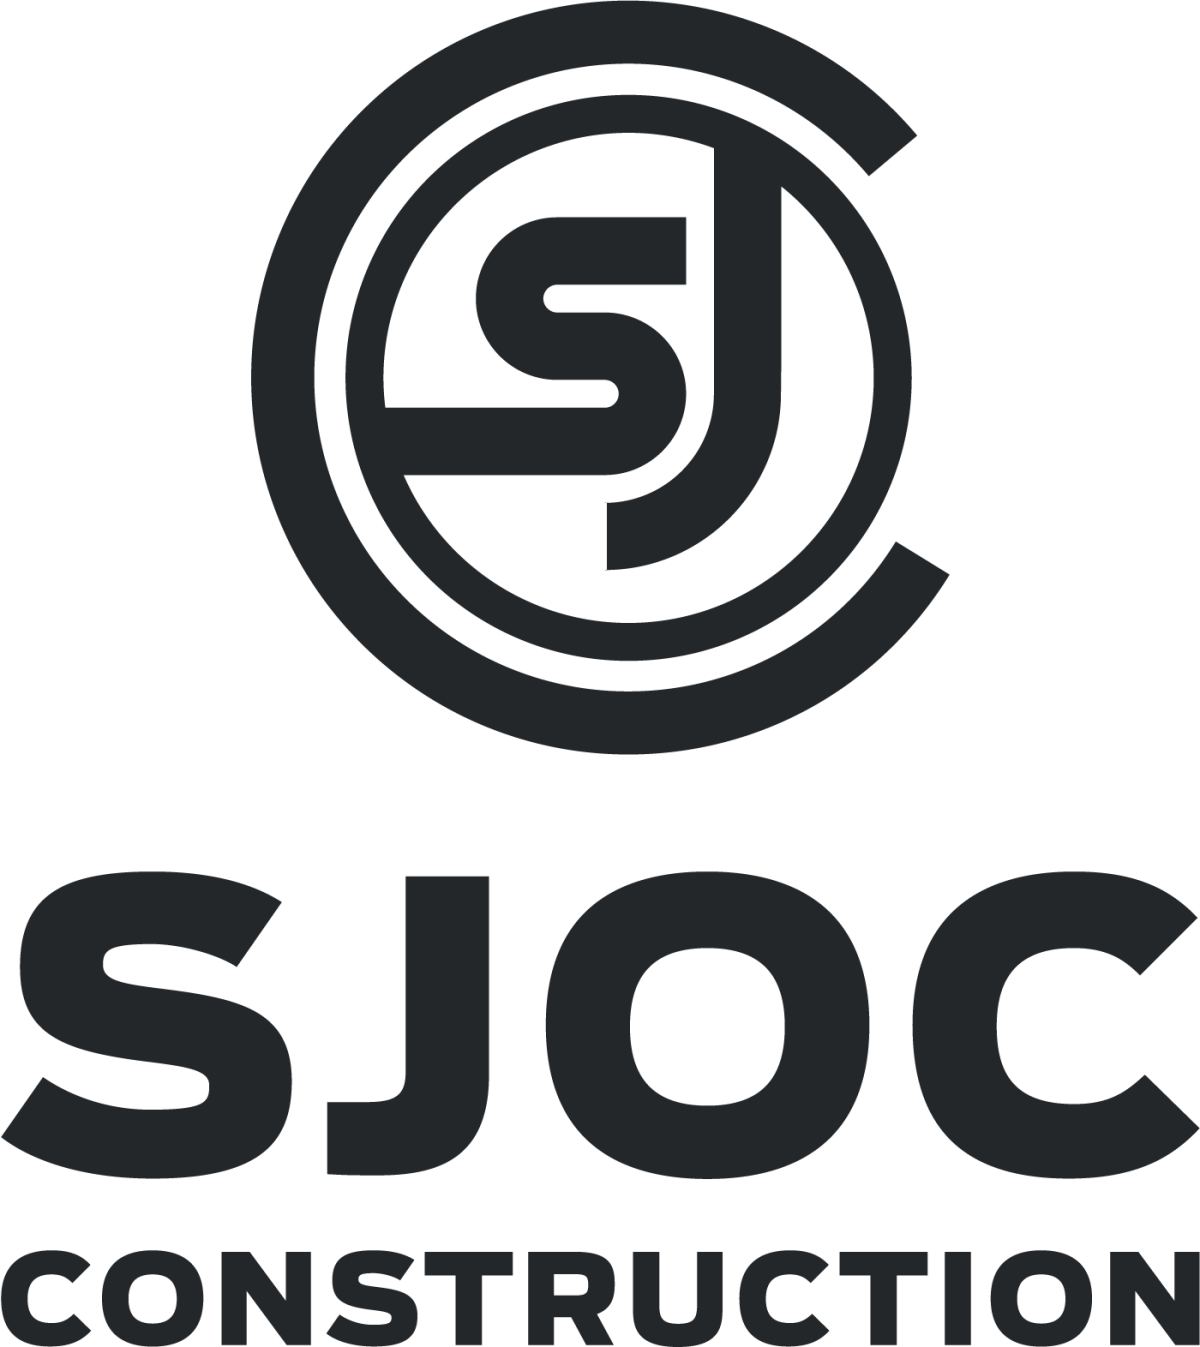 SJOC Construction Logo Redesign - THESECRETSERVICE